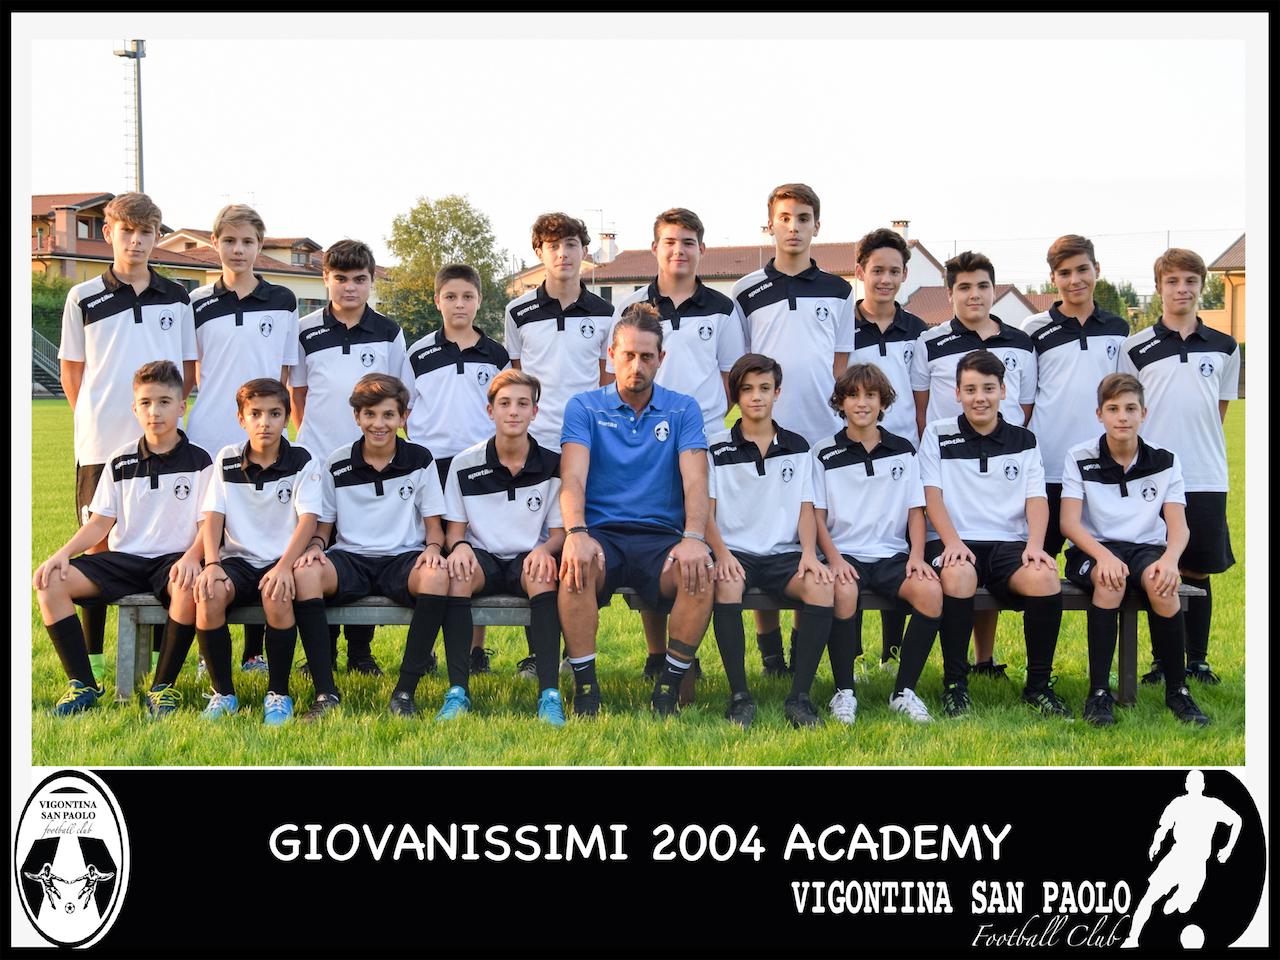 2004 Giovanissimi Academy